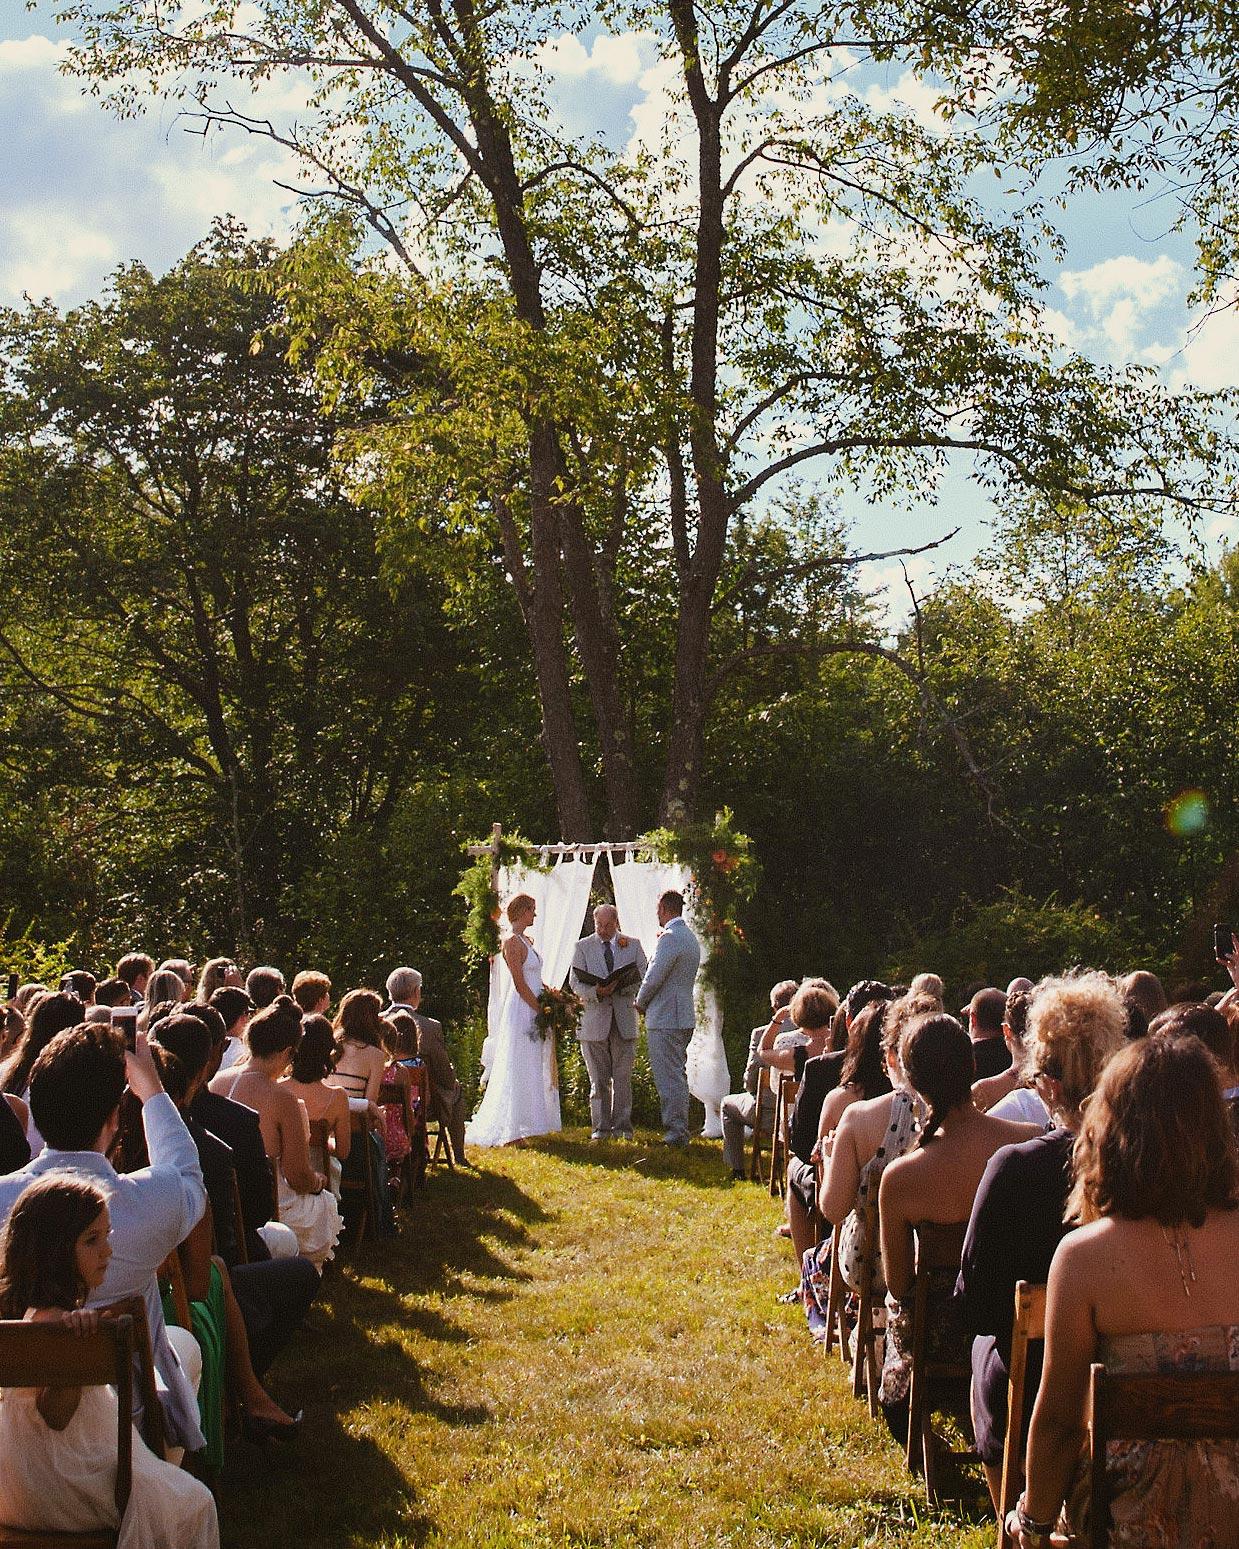 cat-vince-wedding-ceremony-016-s112646-0216.jpg